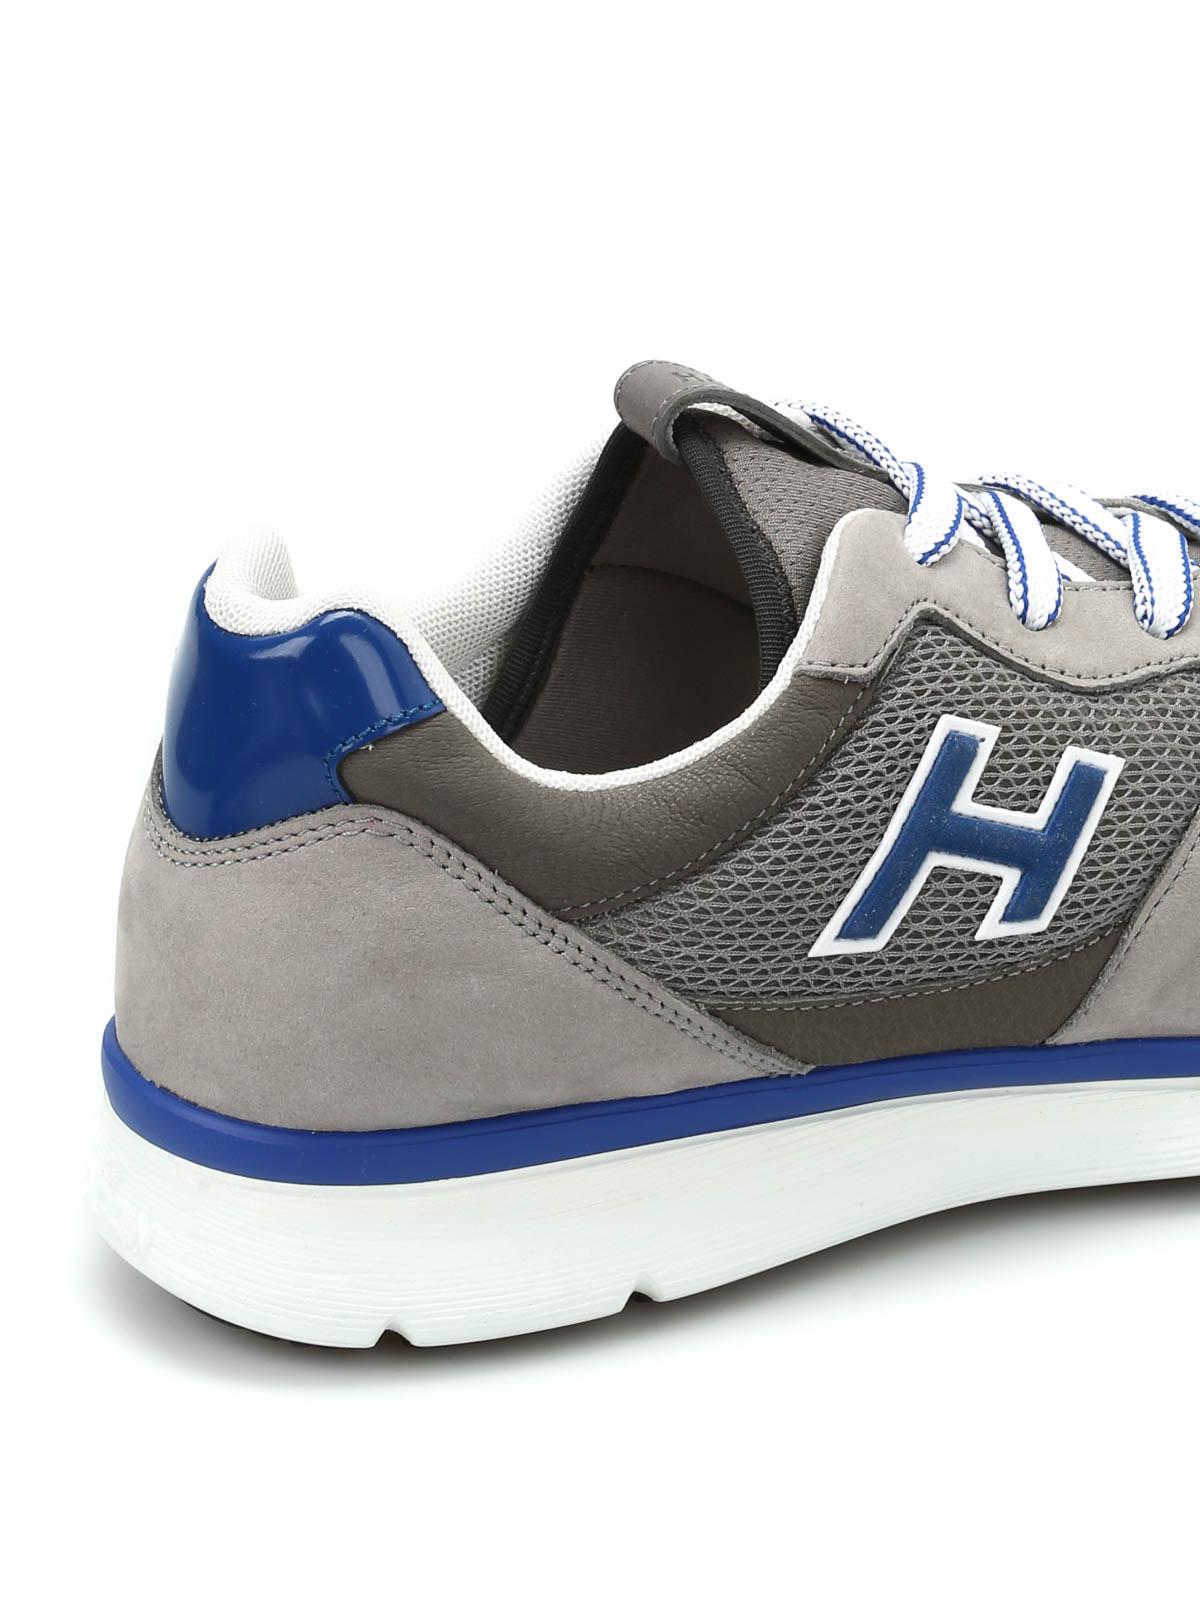 Hogan - H254 New H Flock sneakers - trainers - HXM2540U140CFQ678S